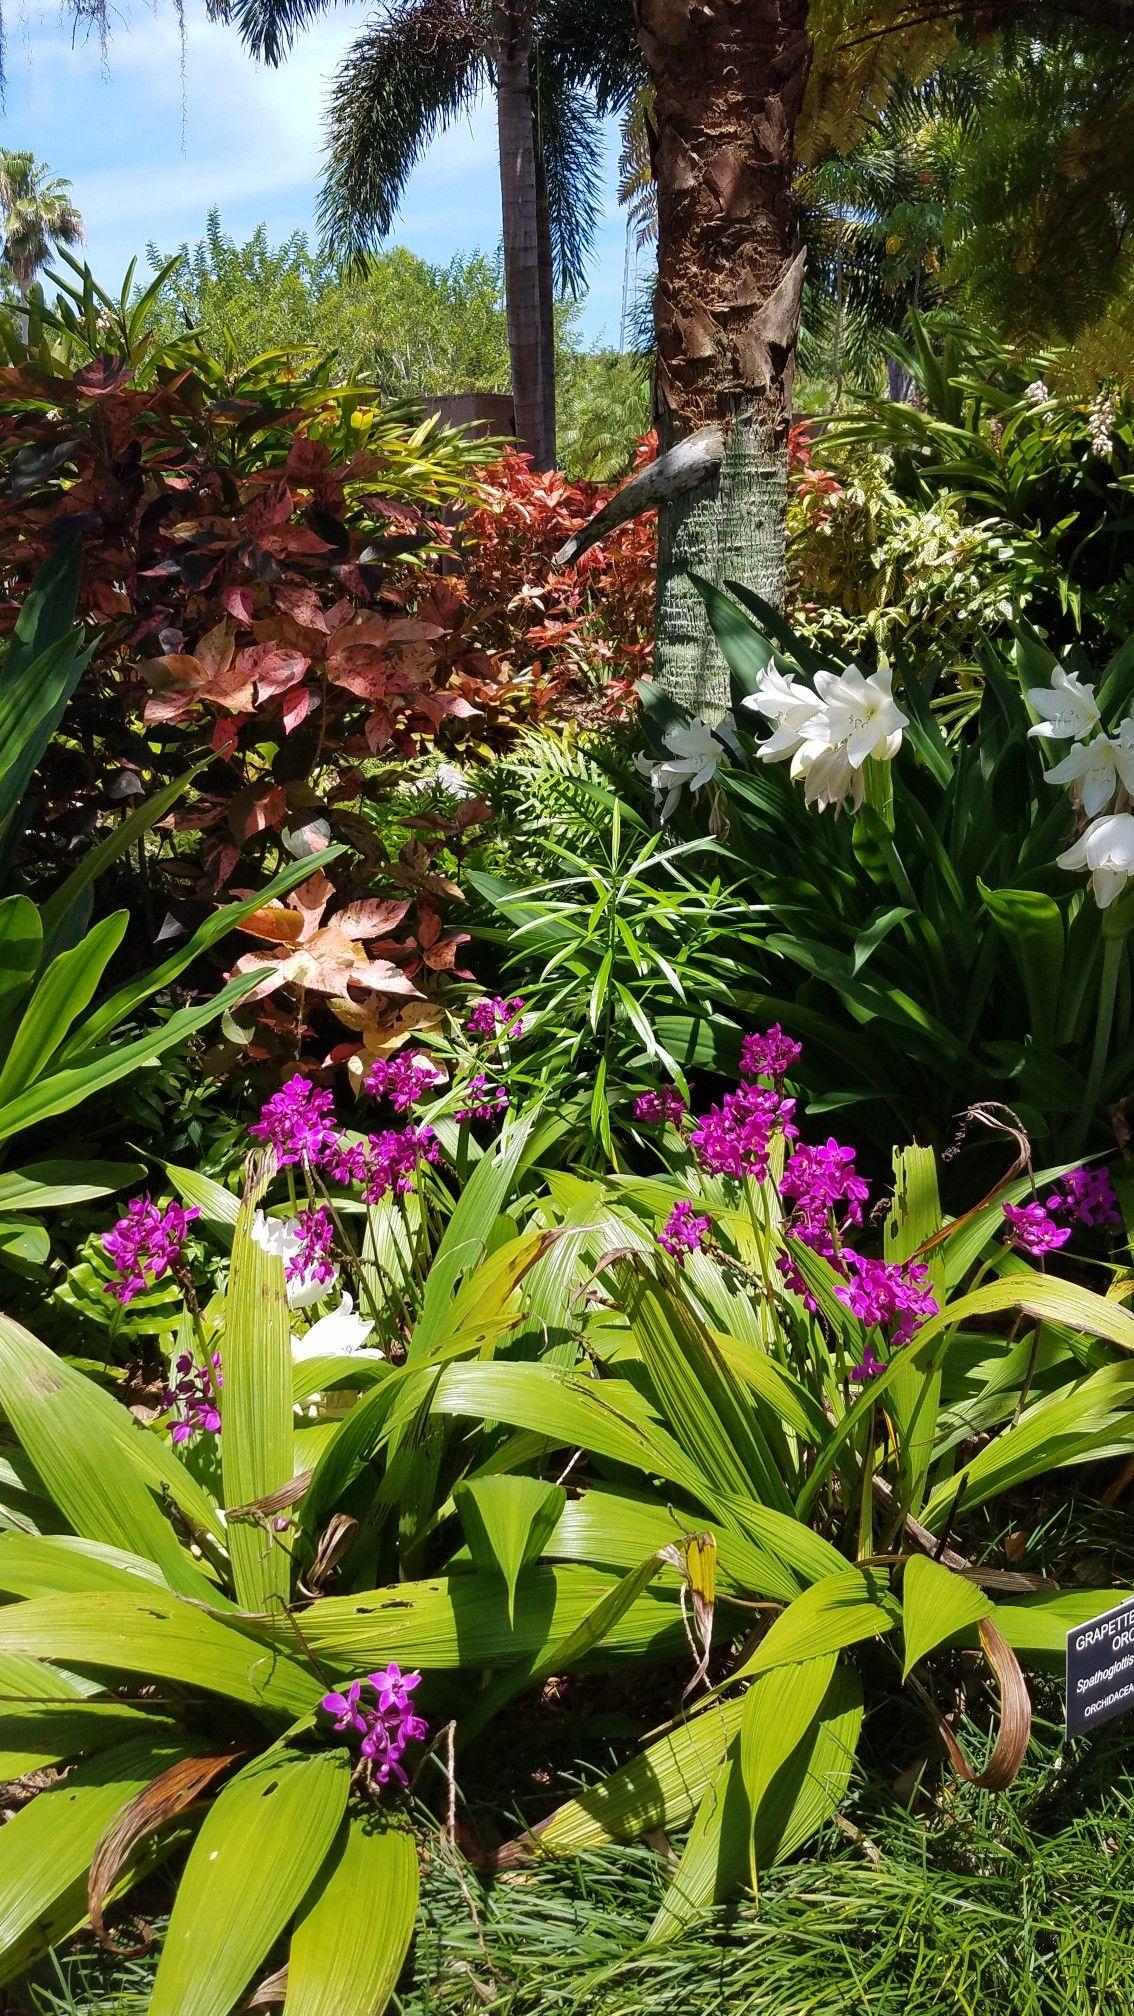 c145e6d098d9d7e8010805a7b35085f7 - The Florida Botanical Gardens In Largo